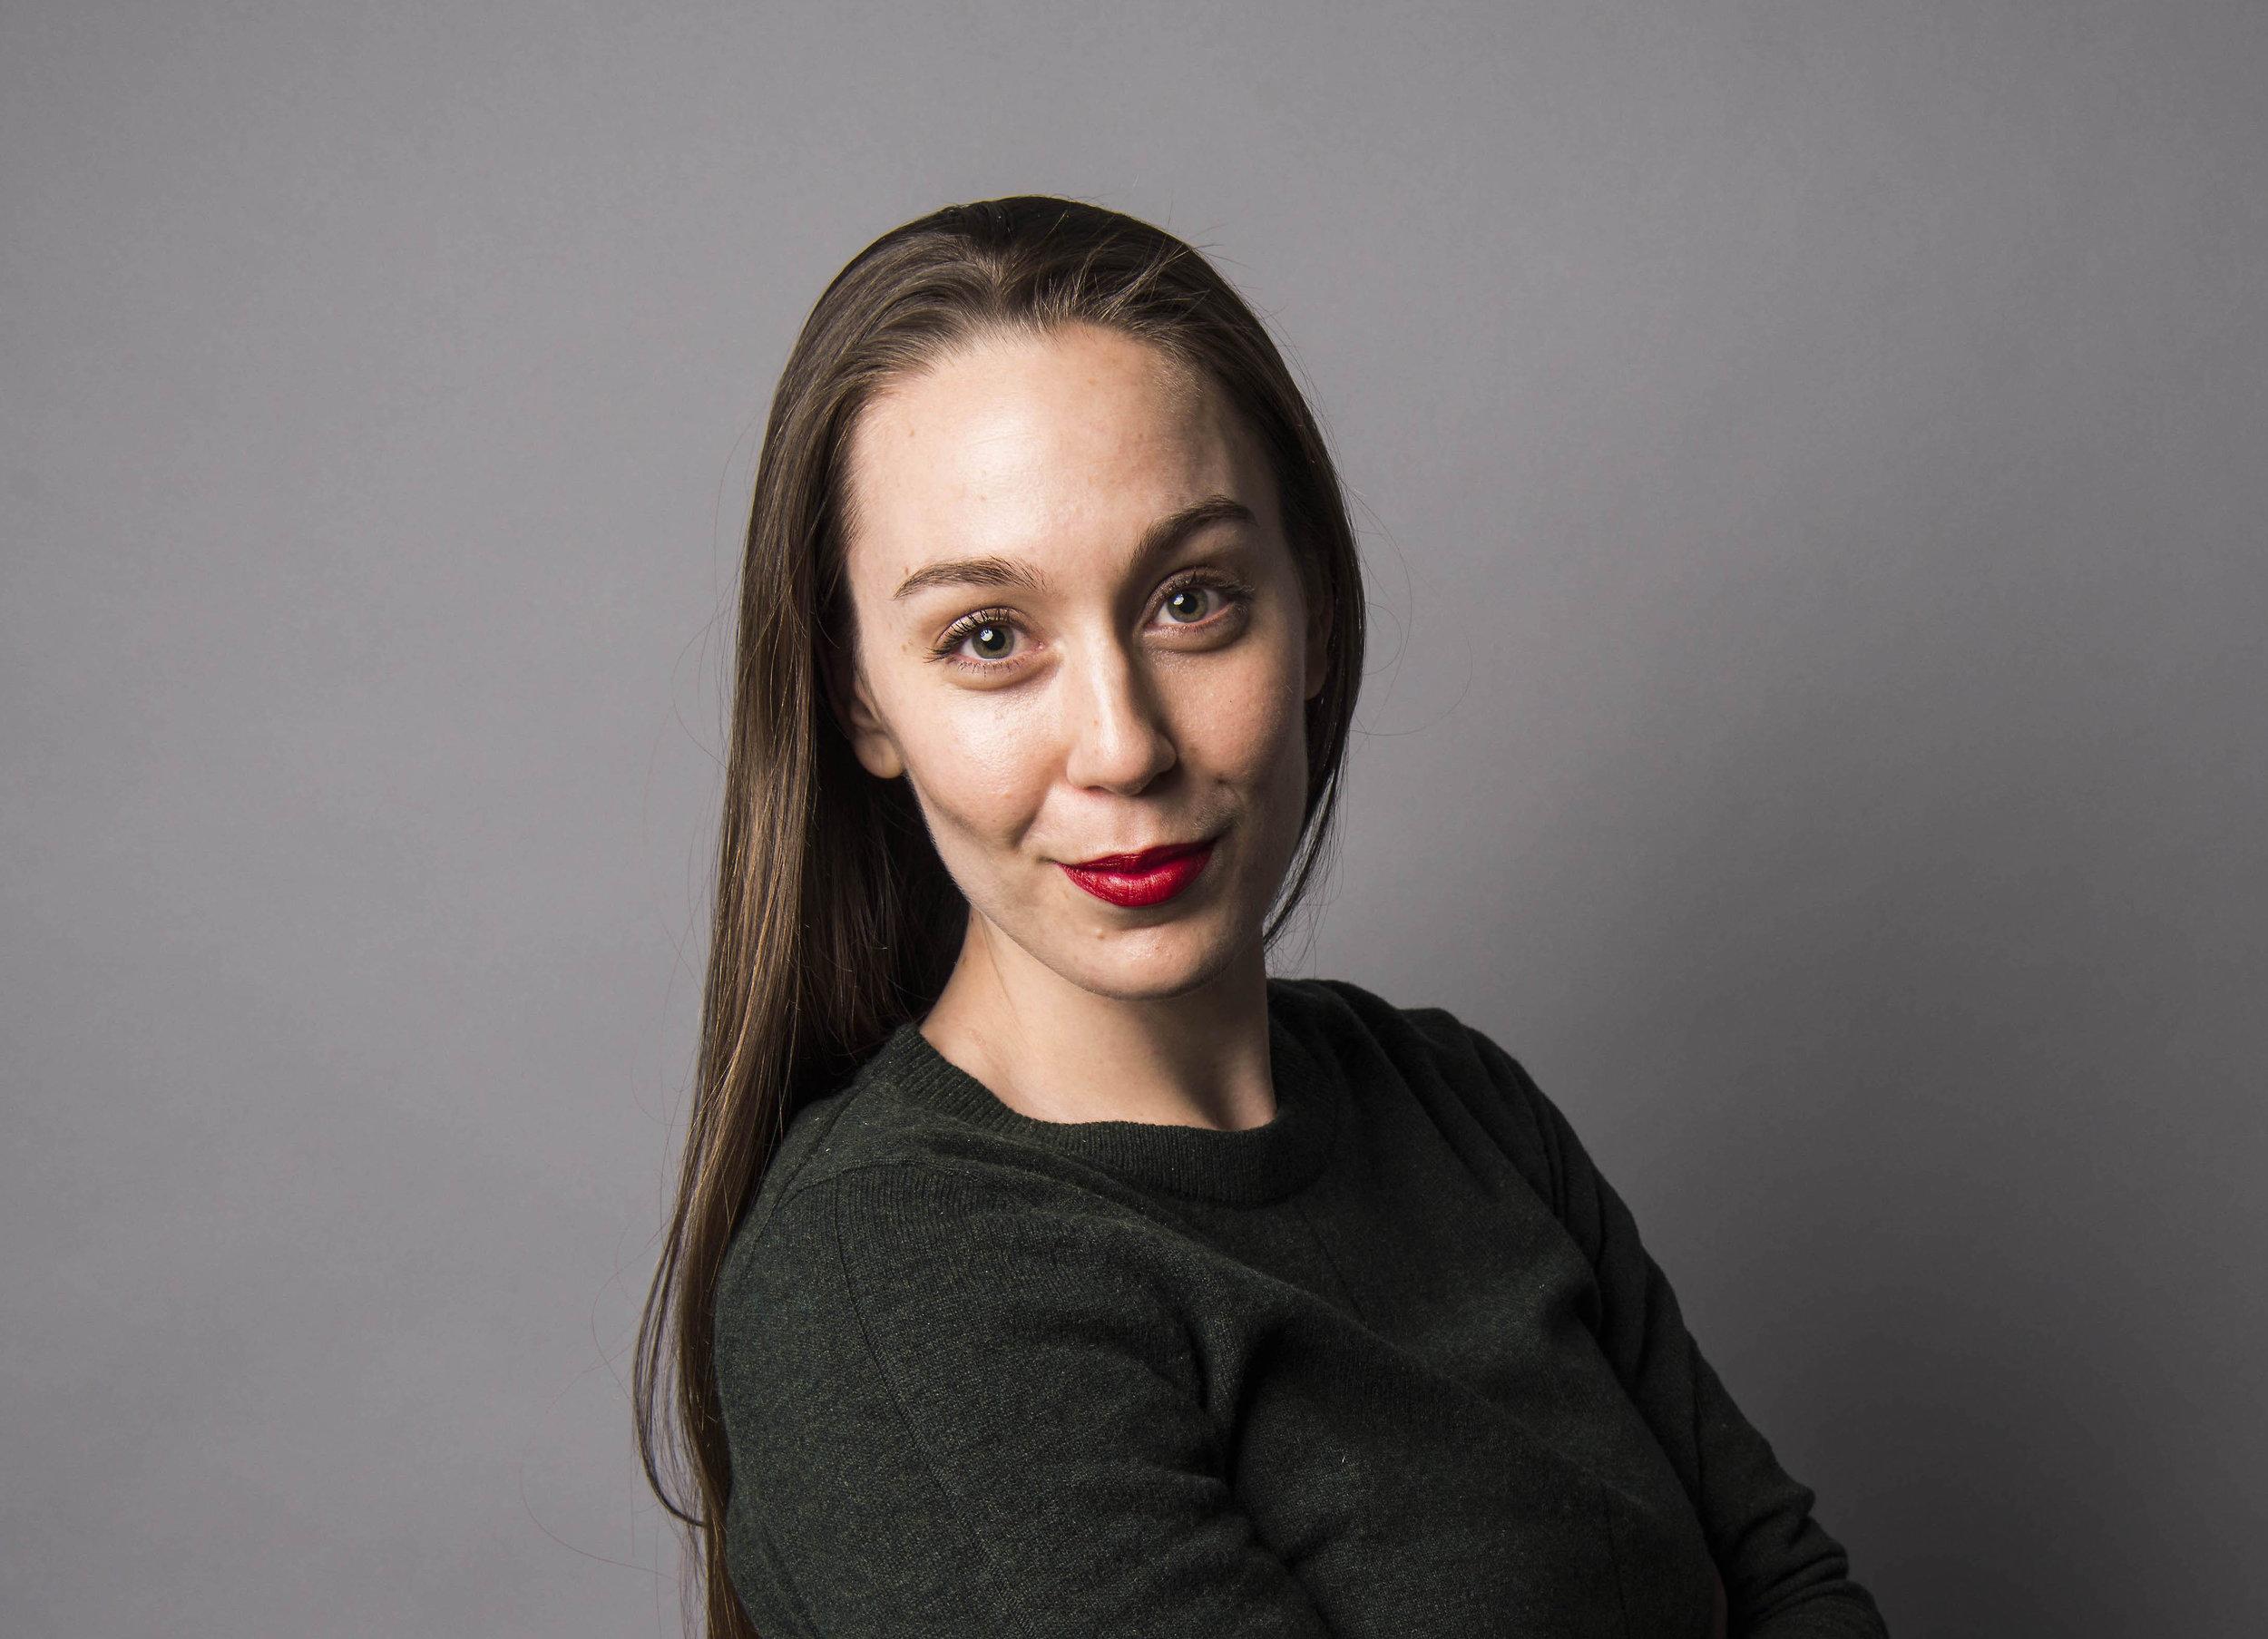 Chloe Angyal